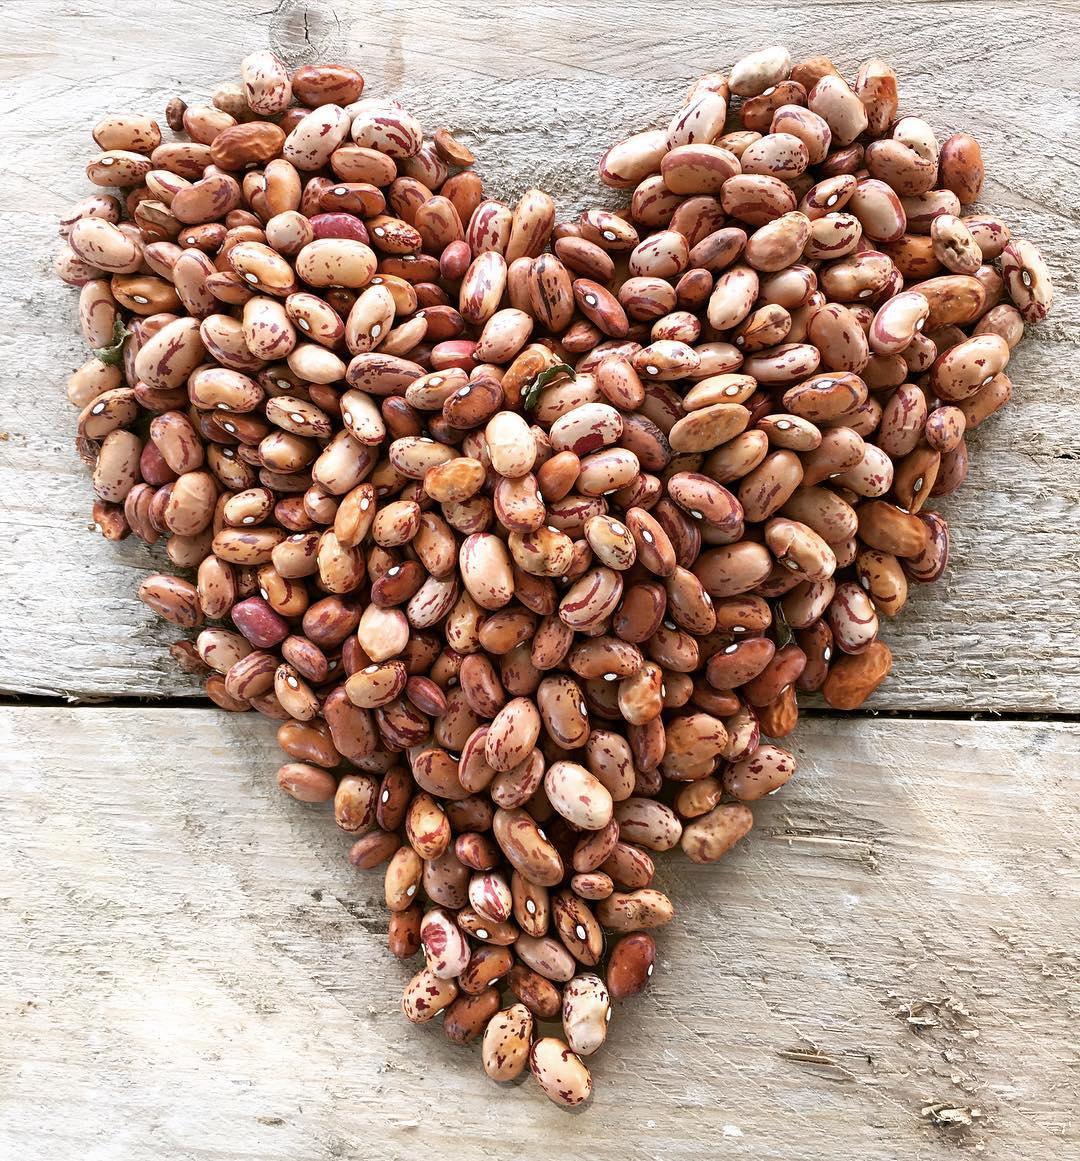 Metterci il cuore, sempre ❤️ #podereargo #instalife #instalove #agriturismo #fagioi #beans #organic #biologico #happiness #love #cuore #heart #pulses #iyp3016 #legumi #sorano #maremma #toscana #tuscany #farmhouse #farmstay #airbnb